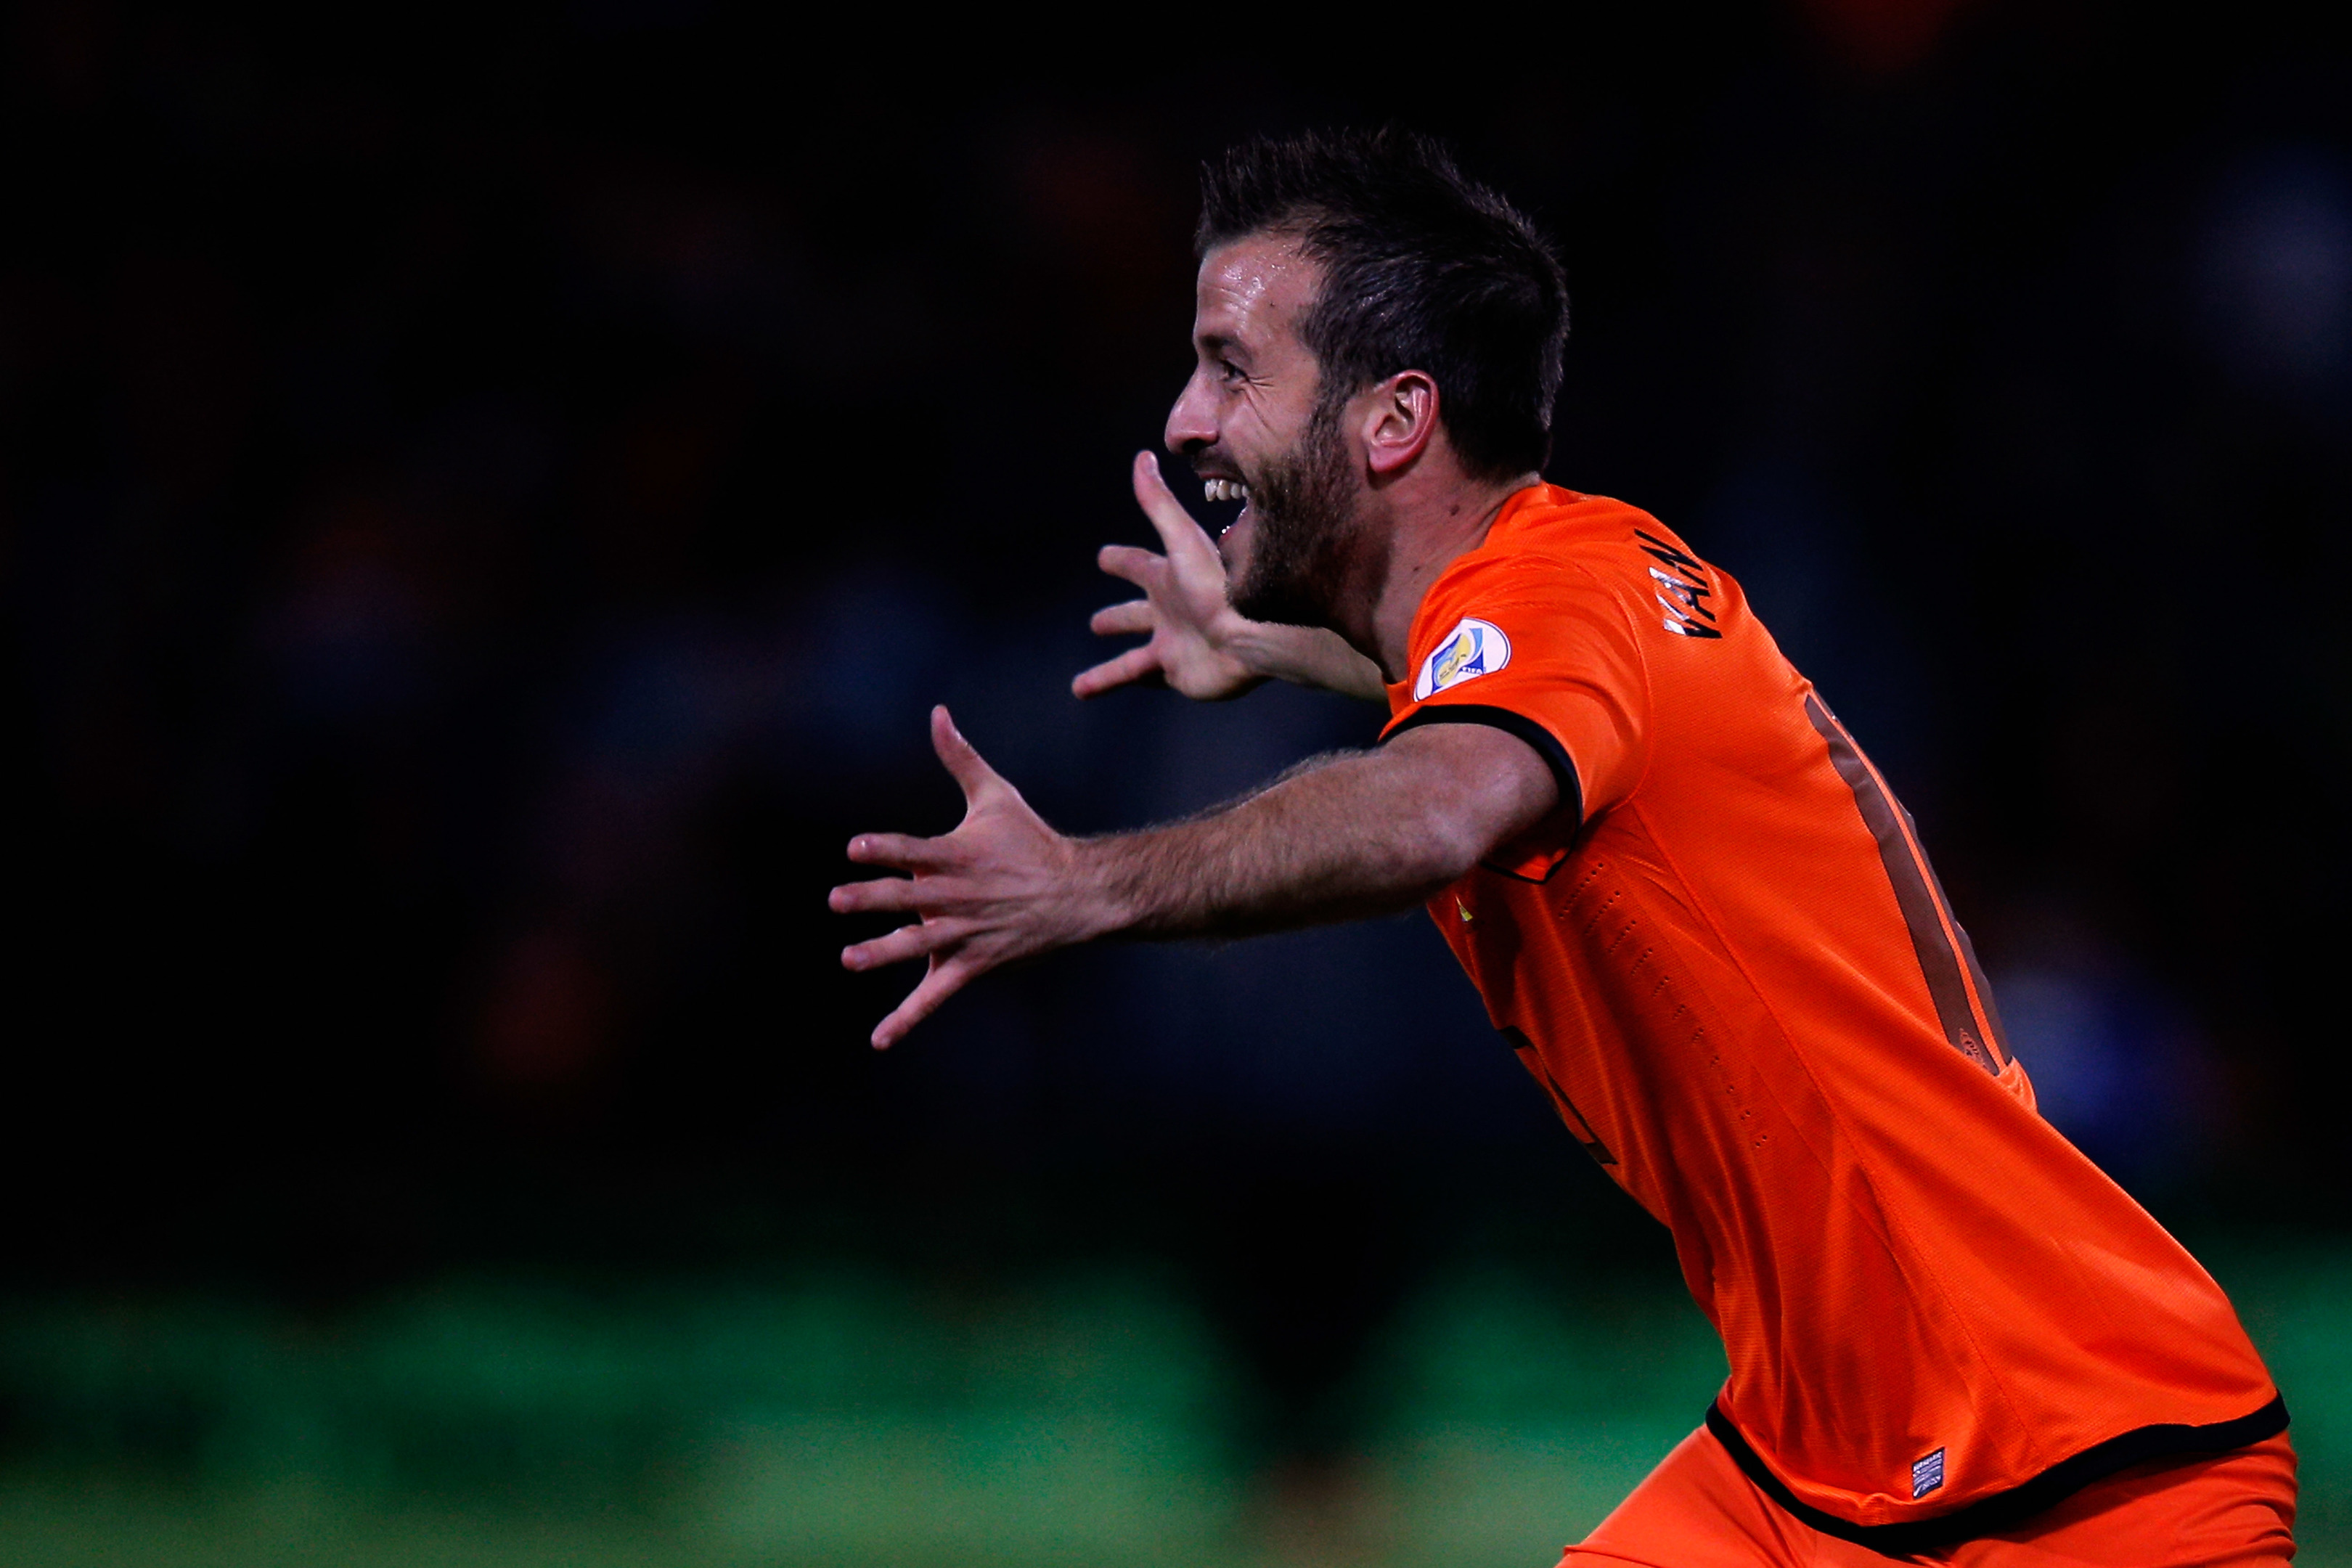 Rafael Van der Vaart in action for the Netherlands (Dean Mouhtaropoulos/Getty Images)